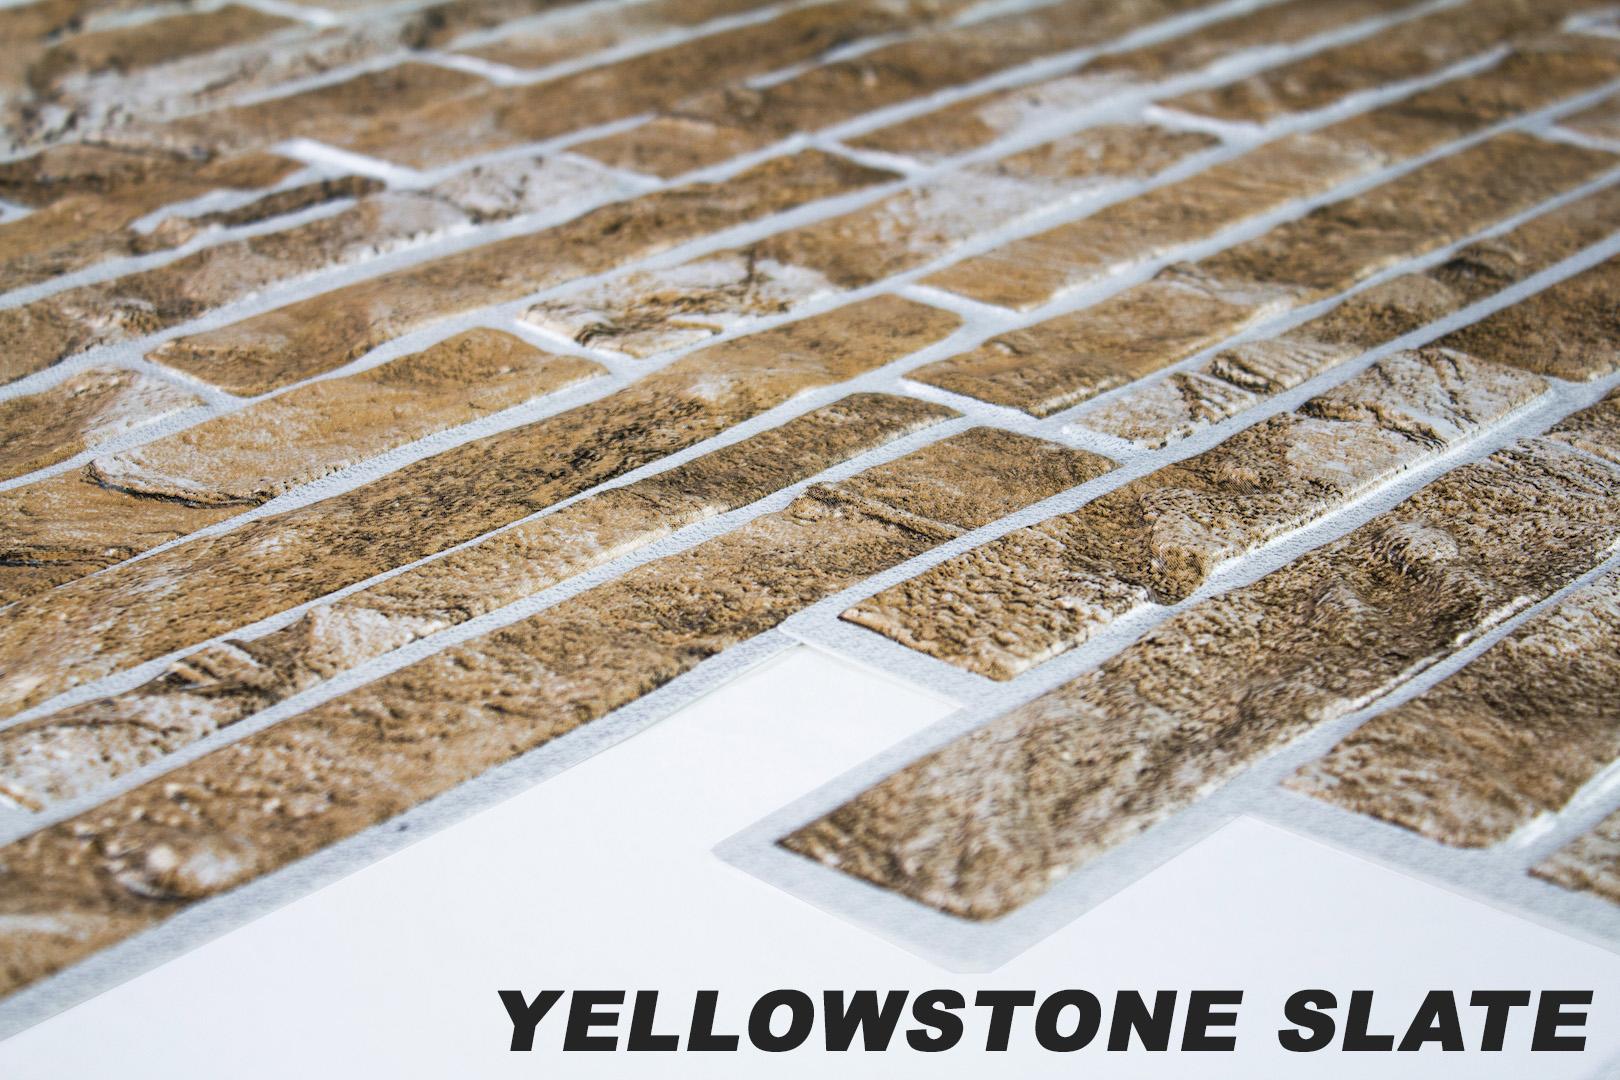 1 pvc dekorplatte mosaic wandverkleidung platten wand 95x48cm yellowstone slate ebay. Black Bedroom Furniture Sets. Home Design Ideas